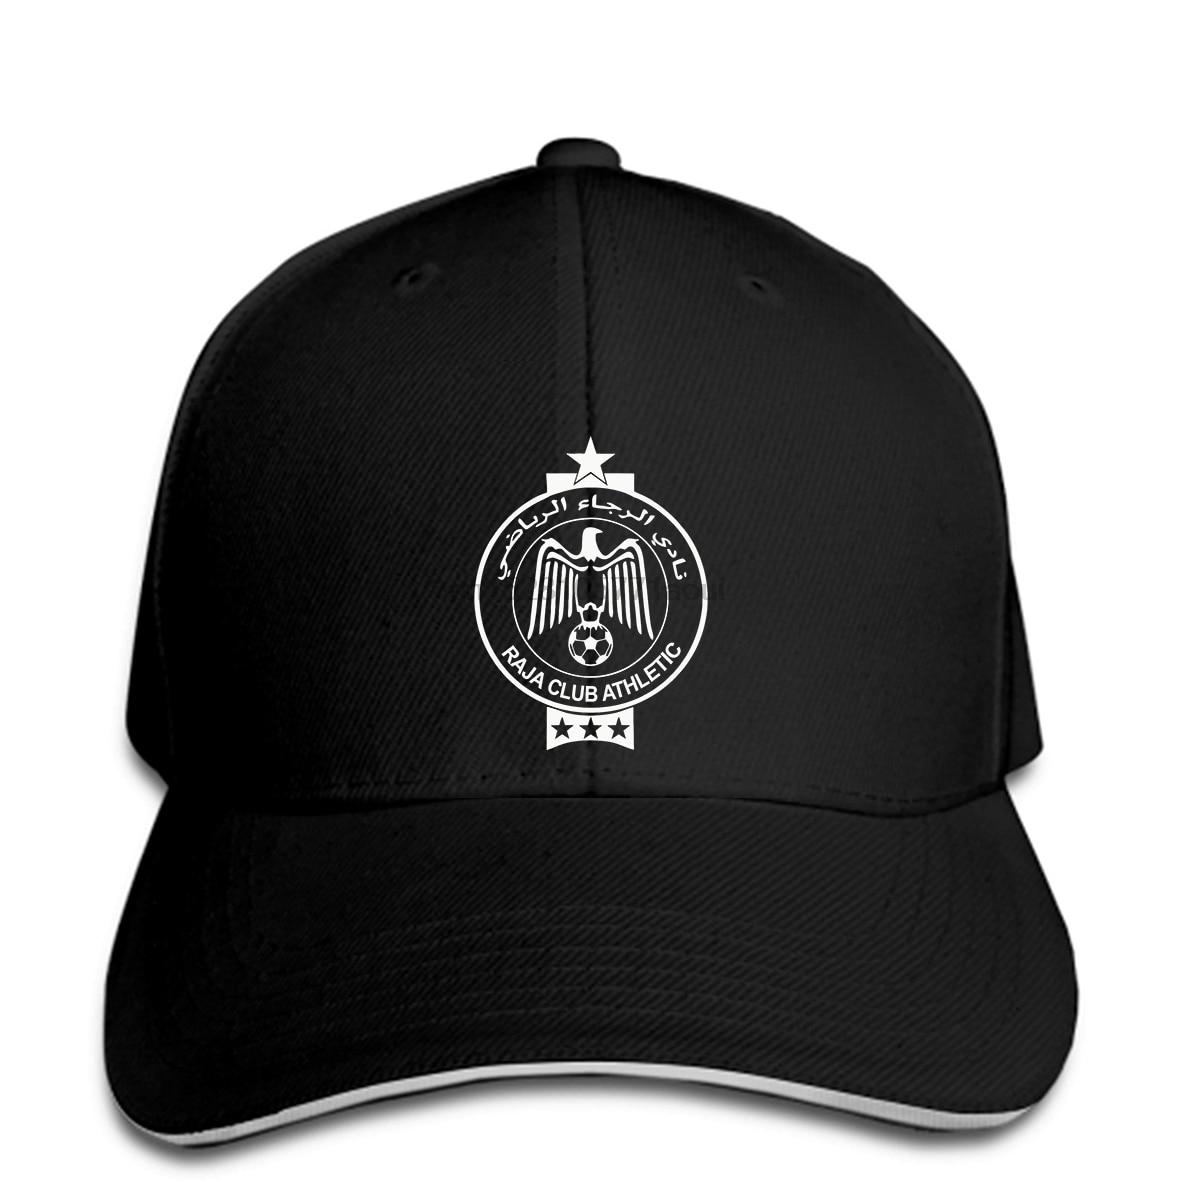 Baseball cap Raja Club Athletic Casablanca Morocco Print hat Handmade Unisex Team Sports